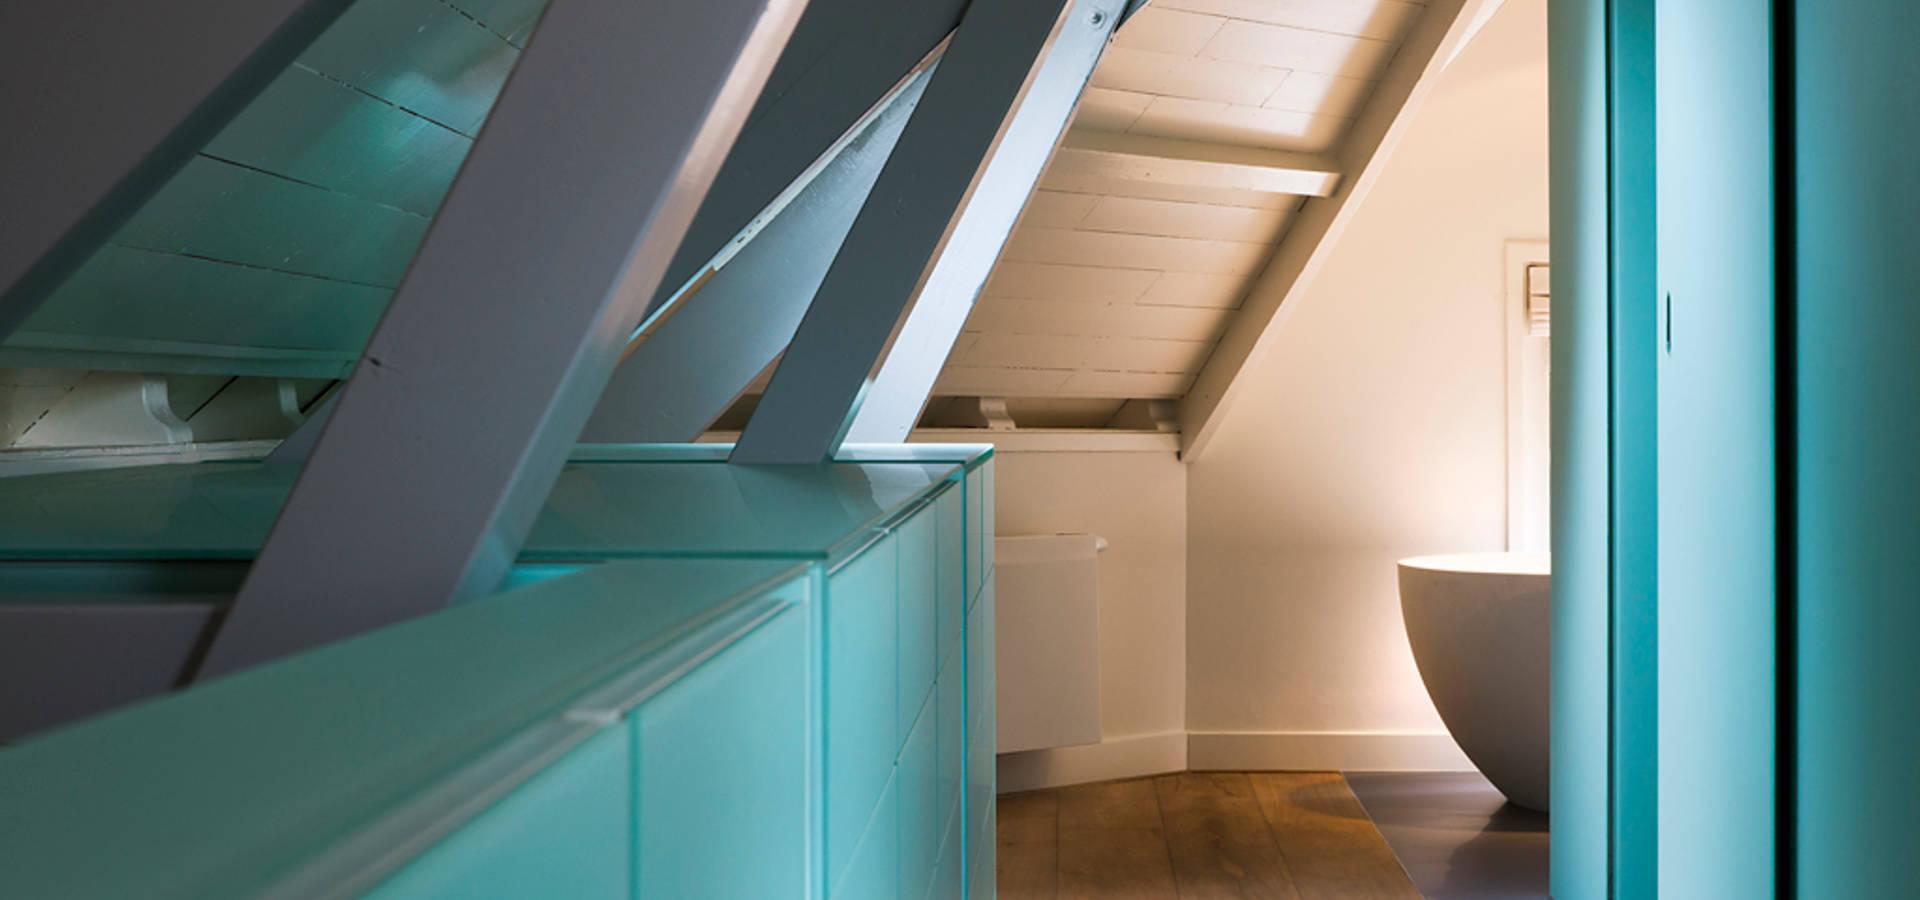 Luxe bad- en slaapkamer in monumentaal pand von a-LEX | homify